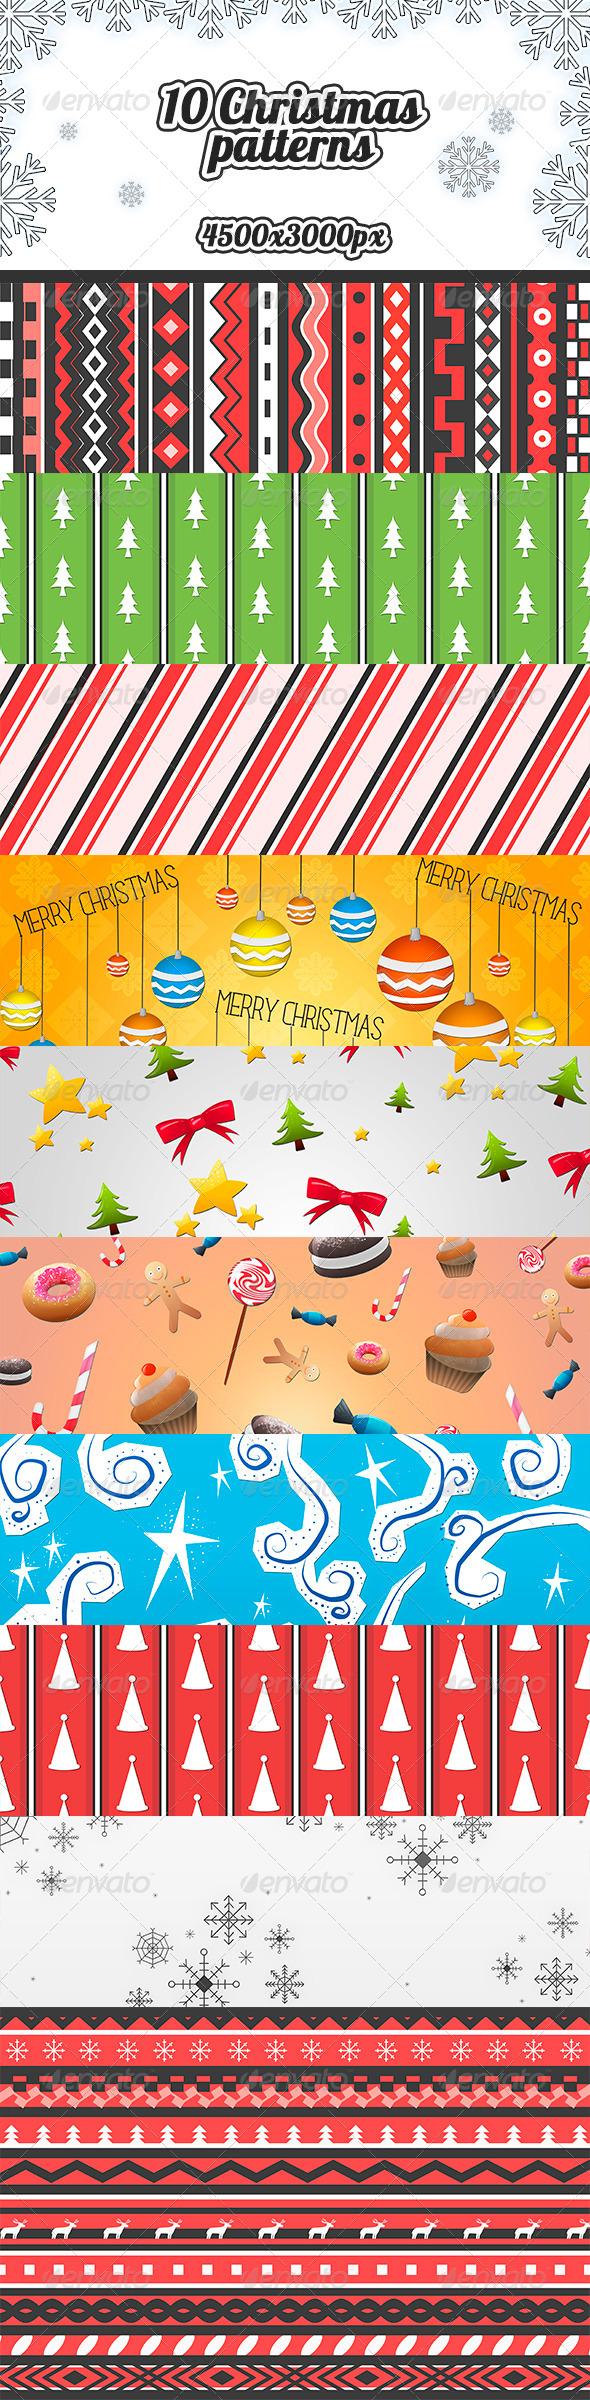 10 Christmas Patterns  - Patterns Backgrounds